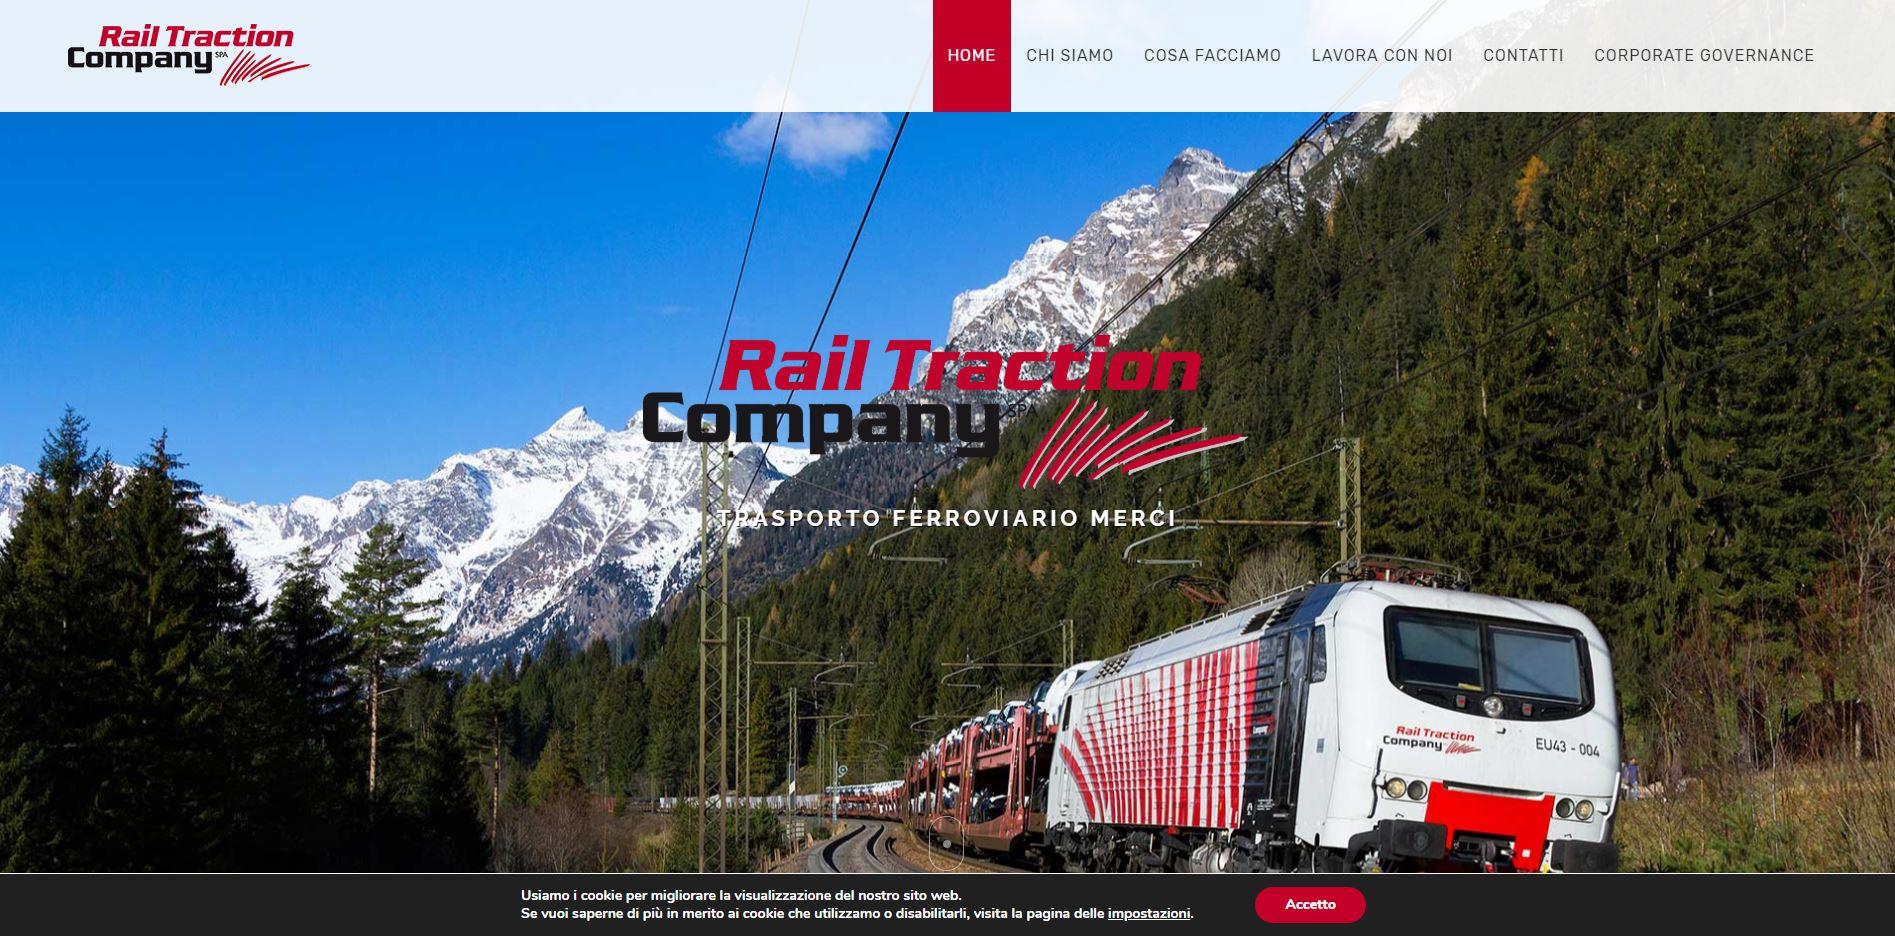 Rail Traction Company Spa